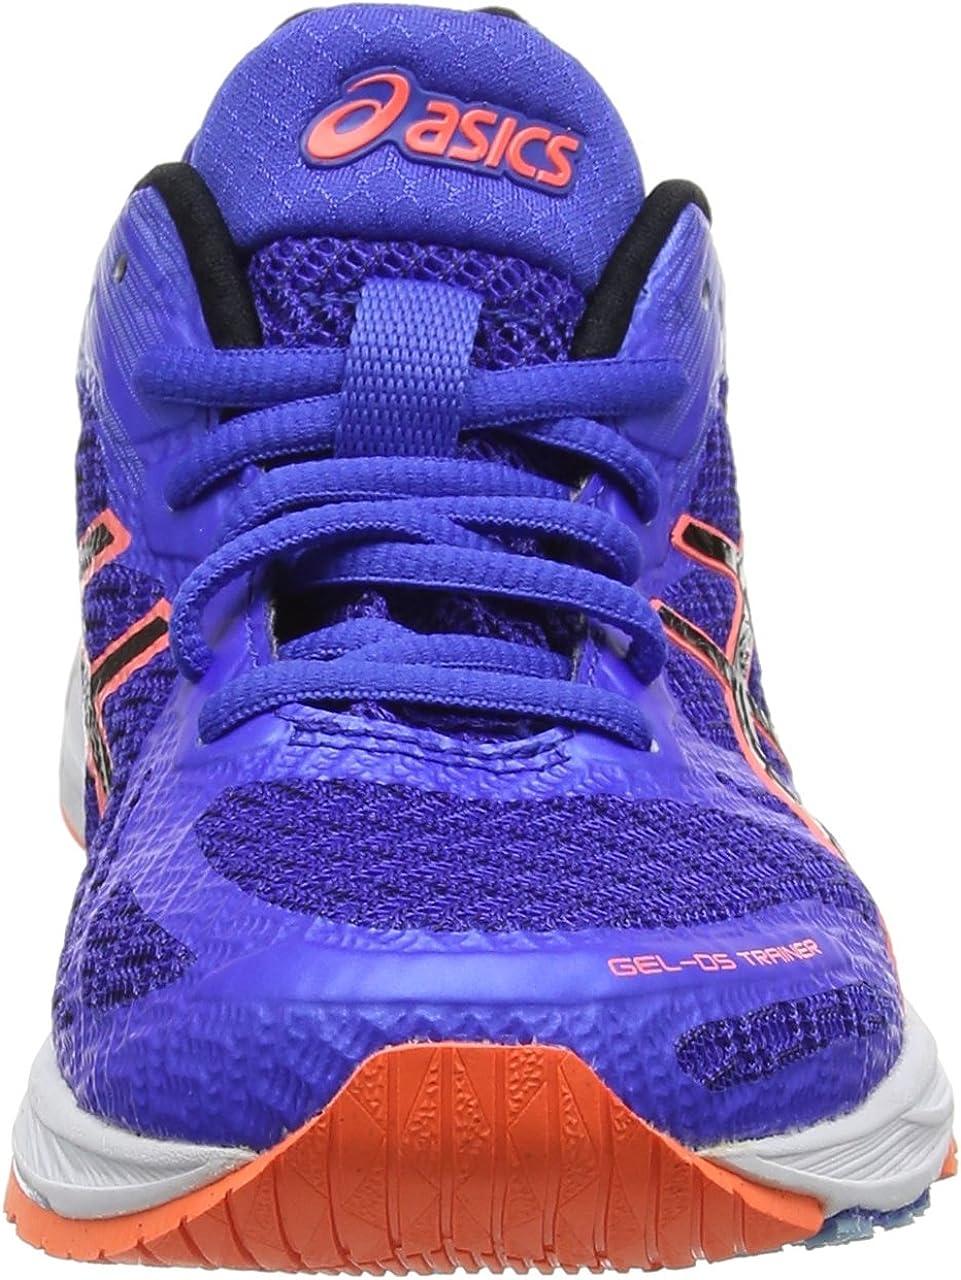 Chaussures de Gymnastique Femme ASICS Gel-DS Trainer 22